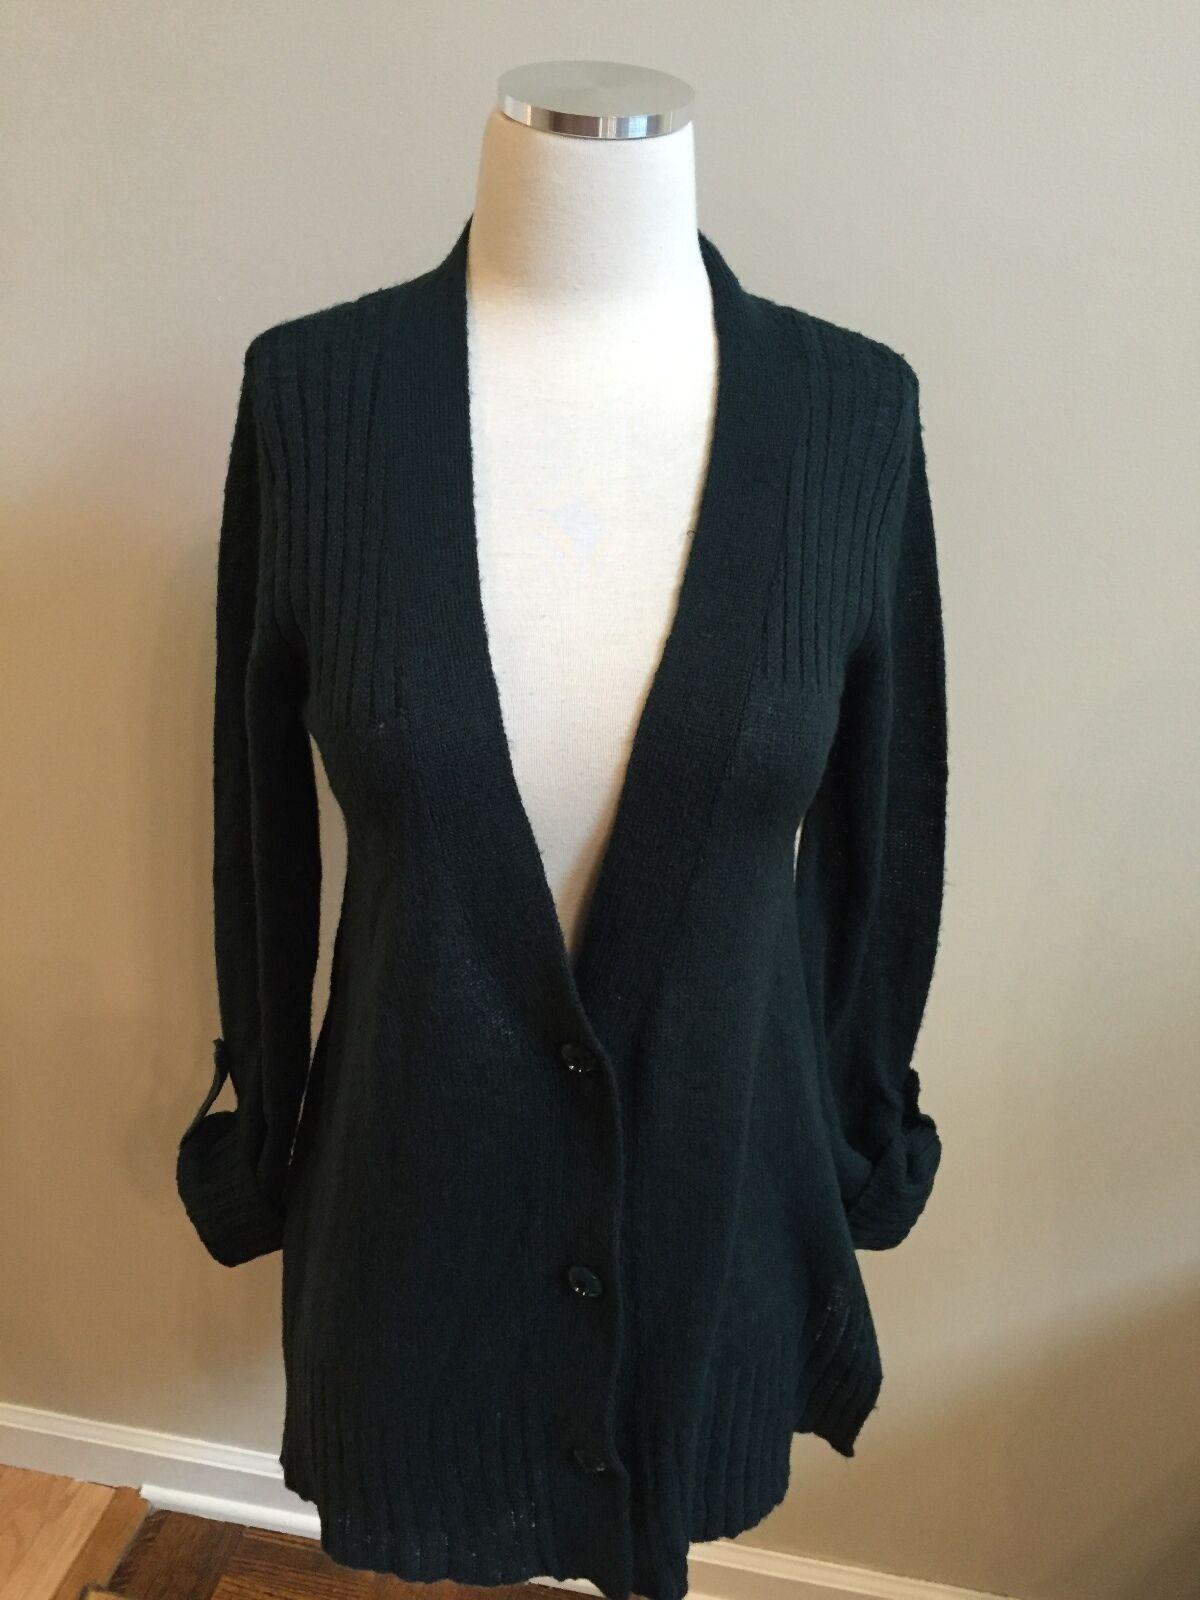 NWT Coldwater Creek Dark Dark Dark Teal bluee Roll Tab Sleeve Boyfriend Cardigan Sweater XS 325795